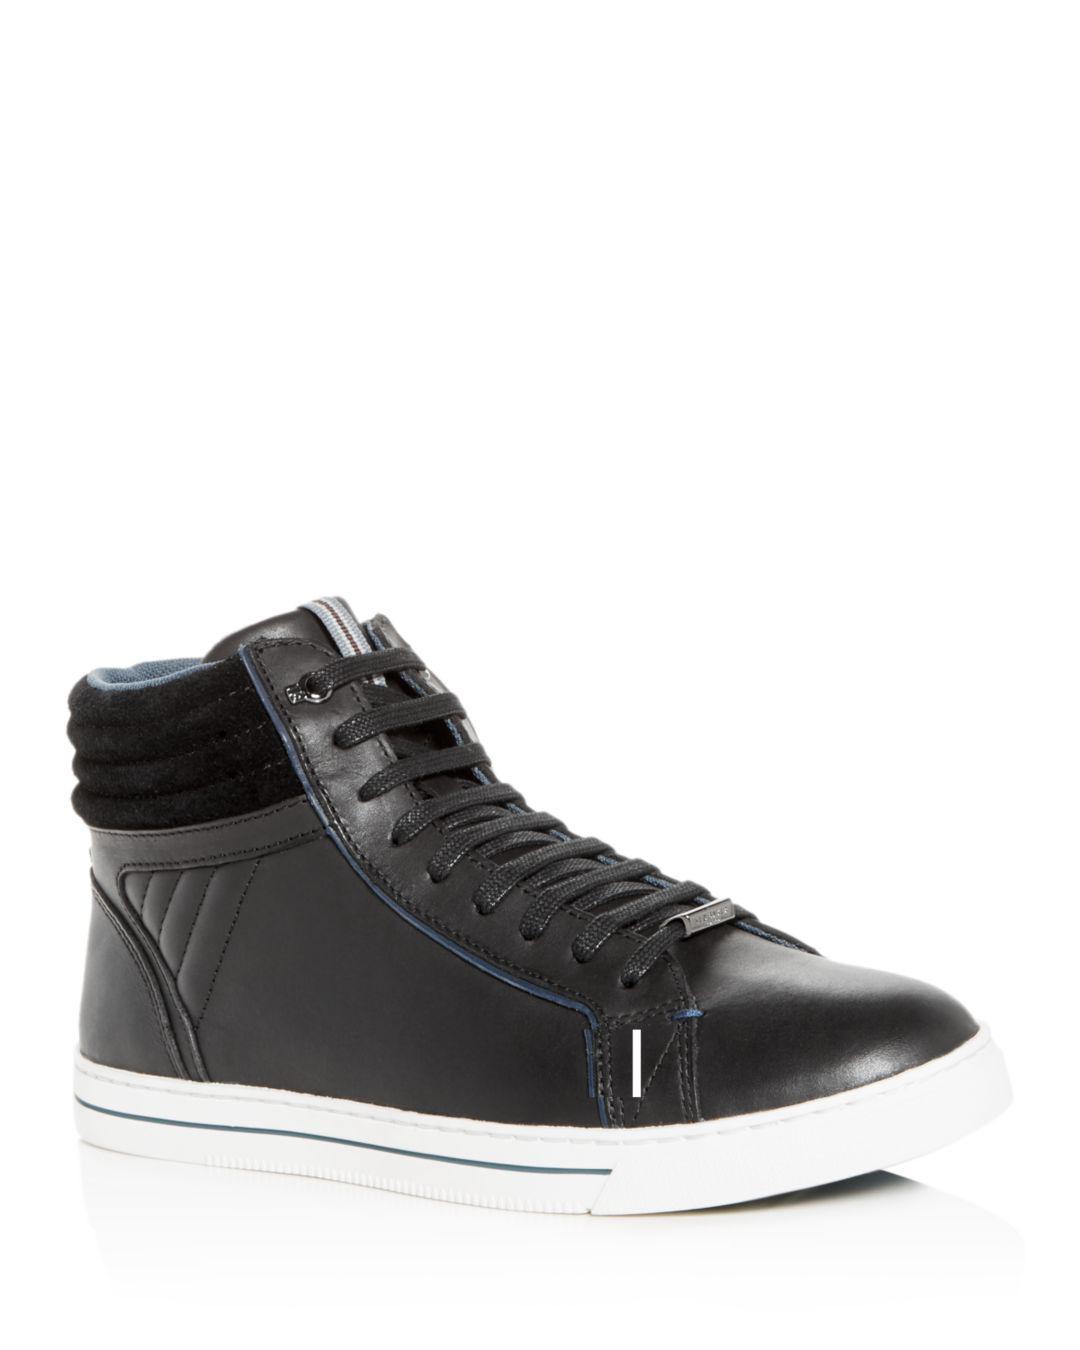 eeafaa1d79 Lyst - Ted Baker Men s Glyburt Leather High-top Sneakers in Black ...